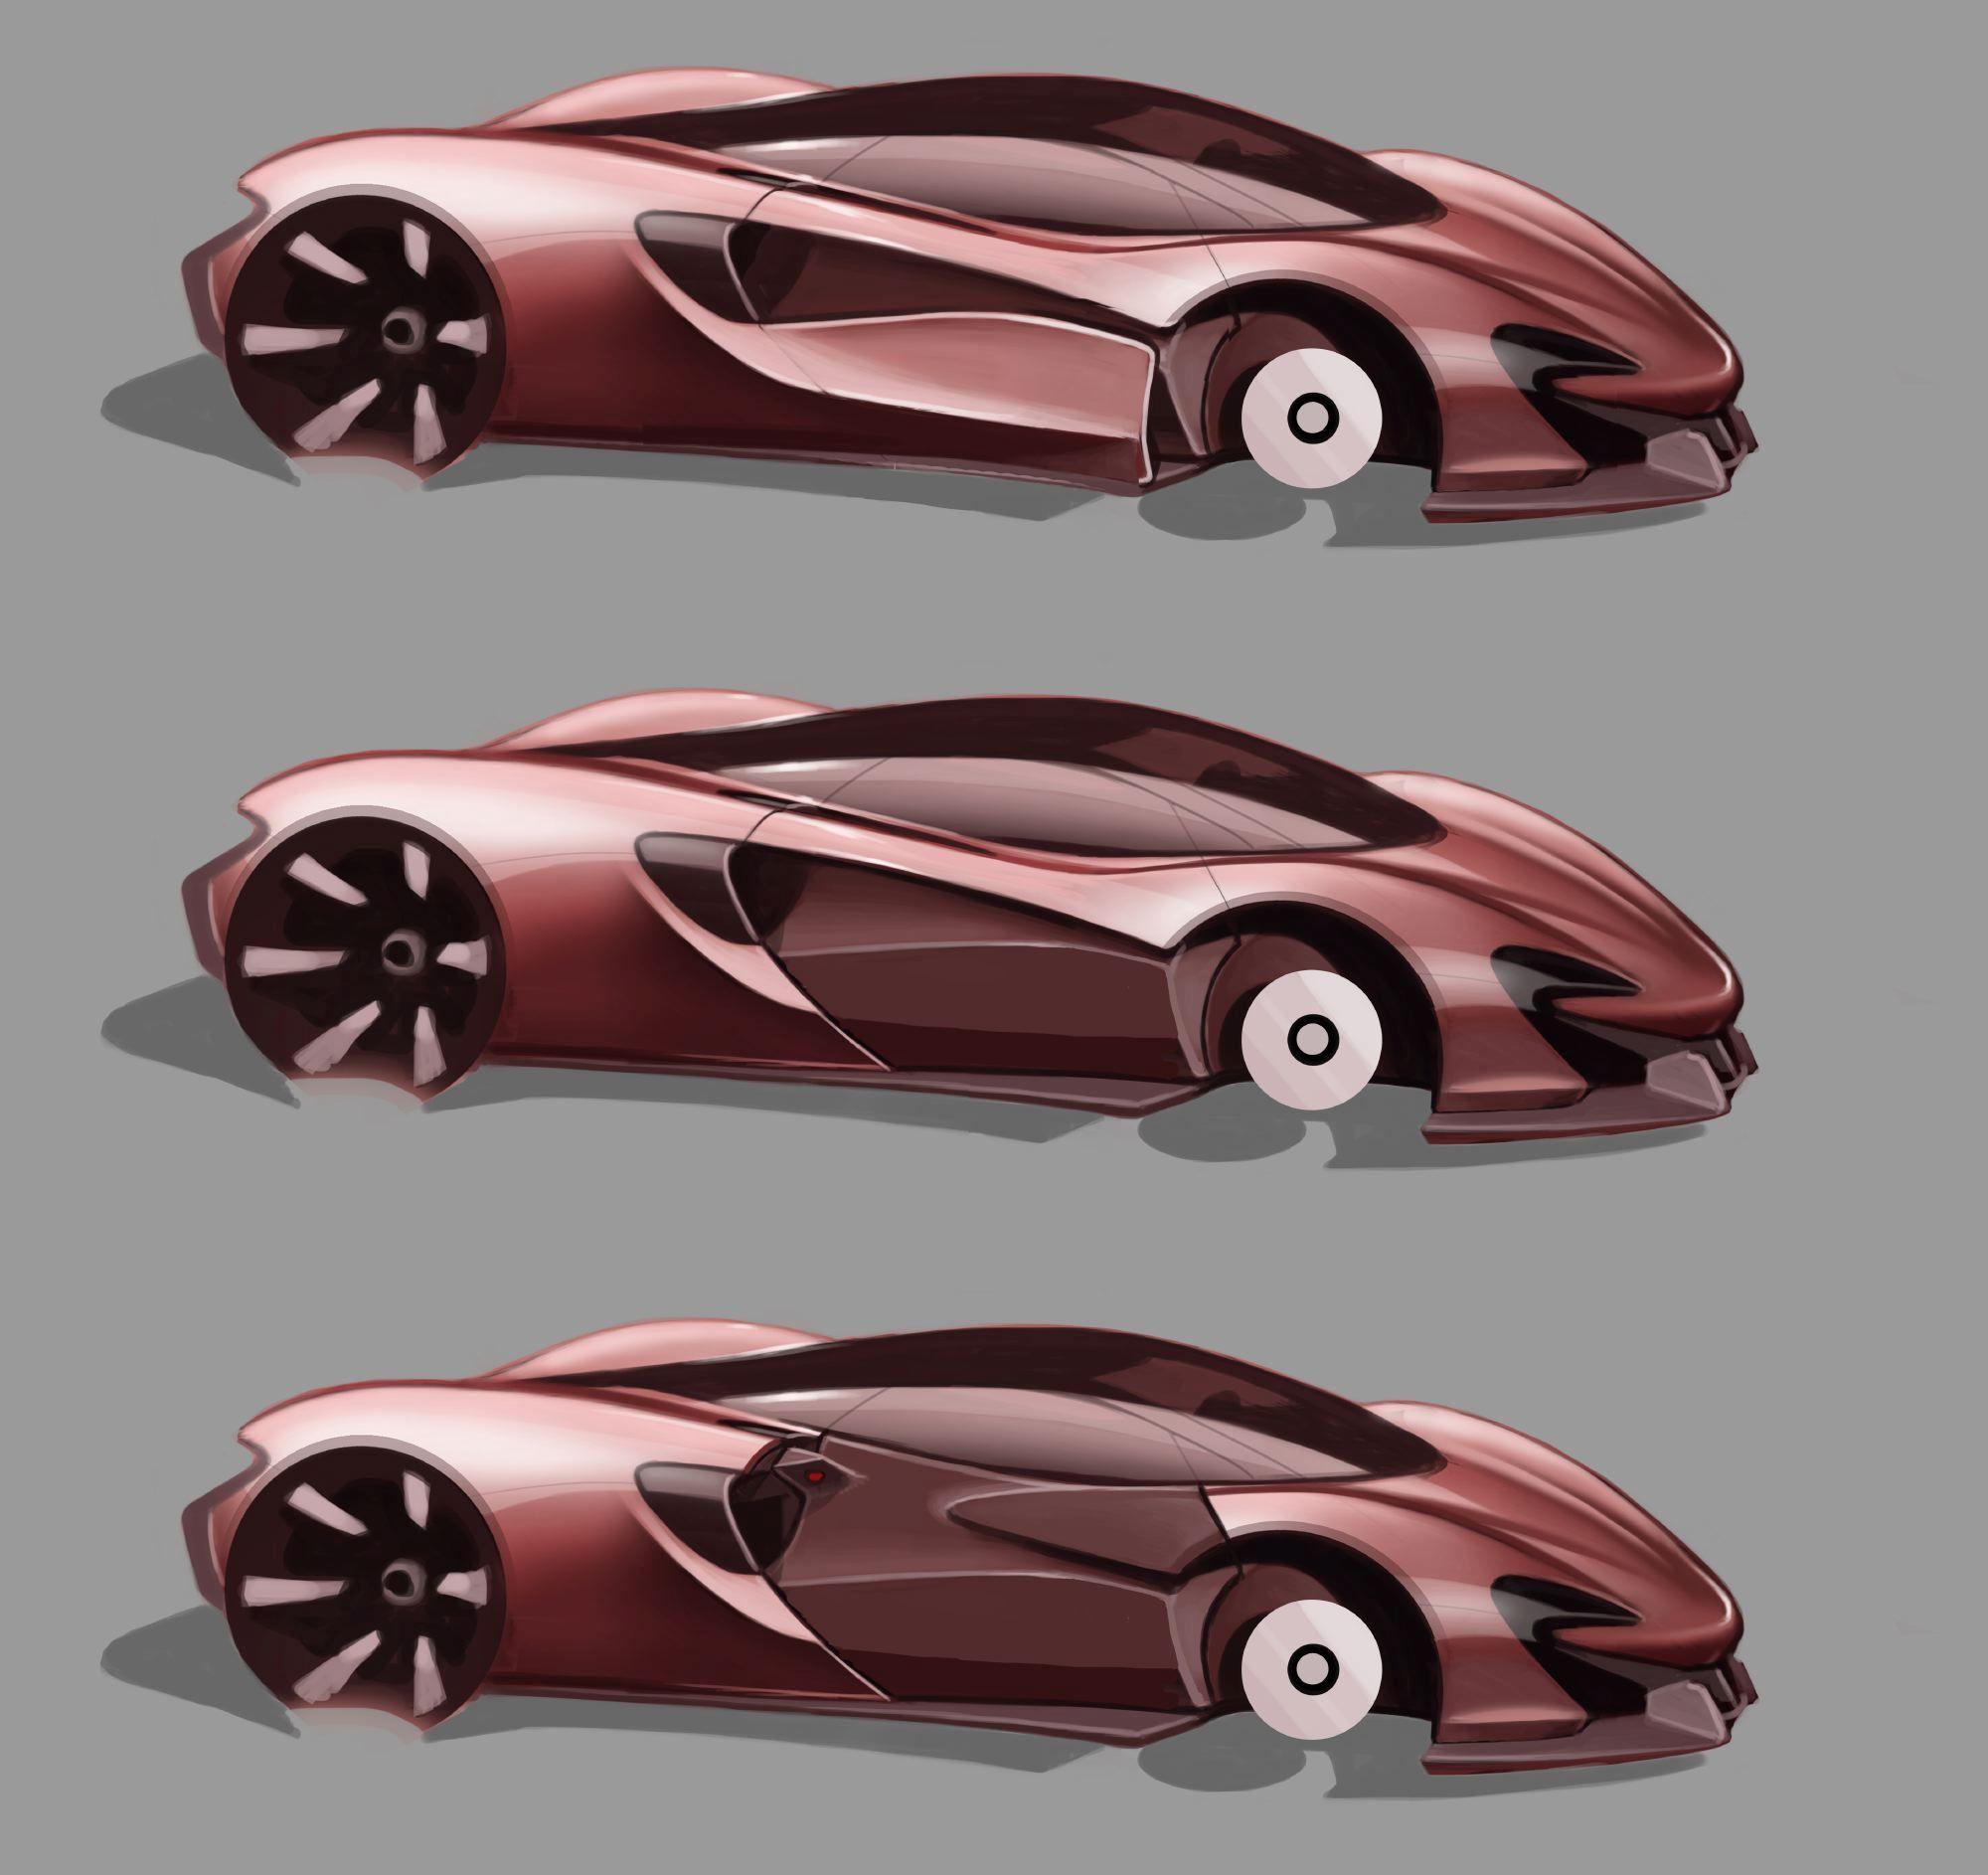 Design Development Mclaren 570s Car Design News Car Design Sketch Car Design Automotive Design